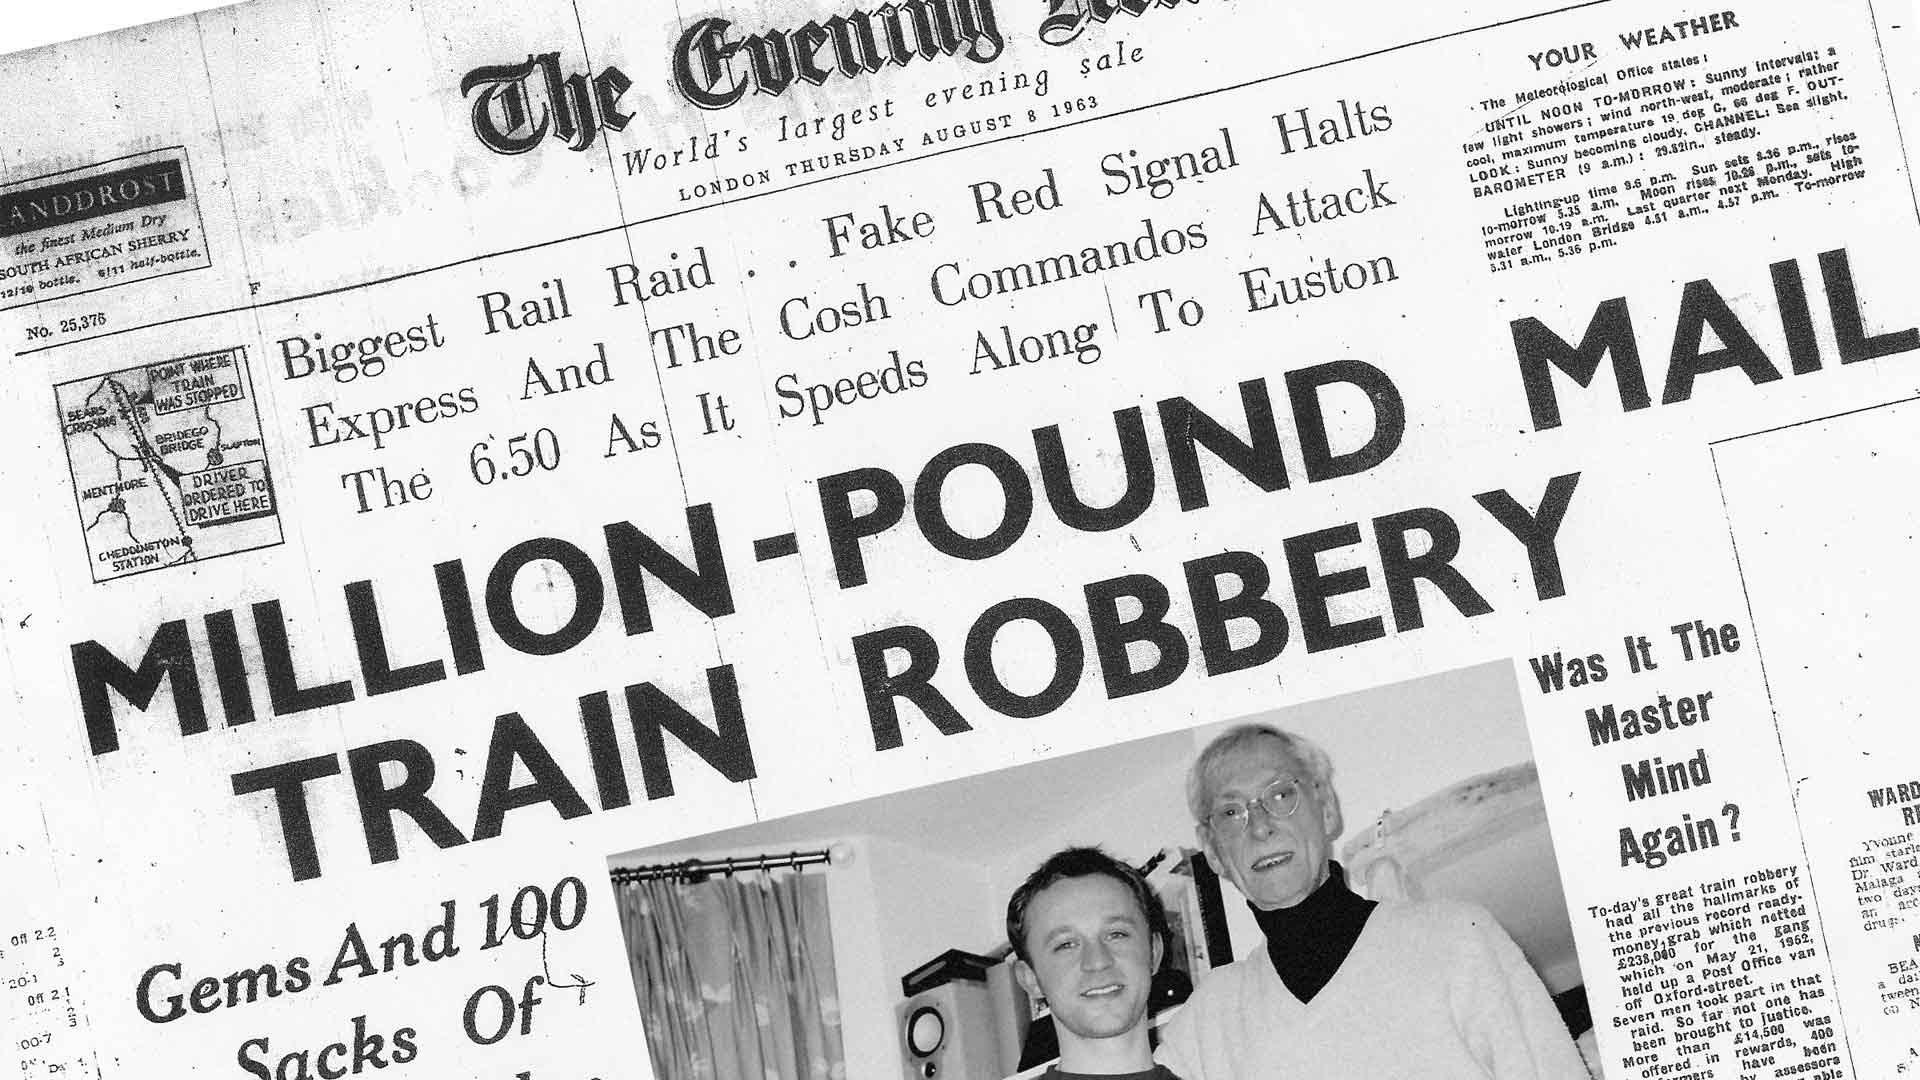 Заголовок газеты от 8августа 1963 года. <br>